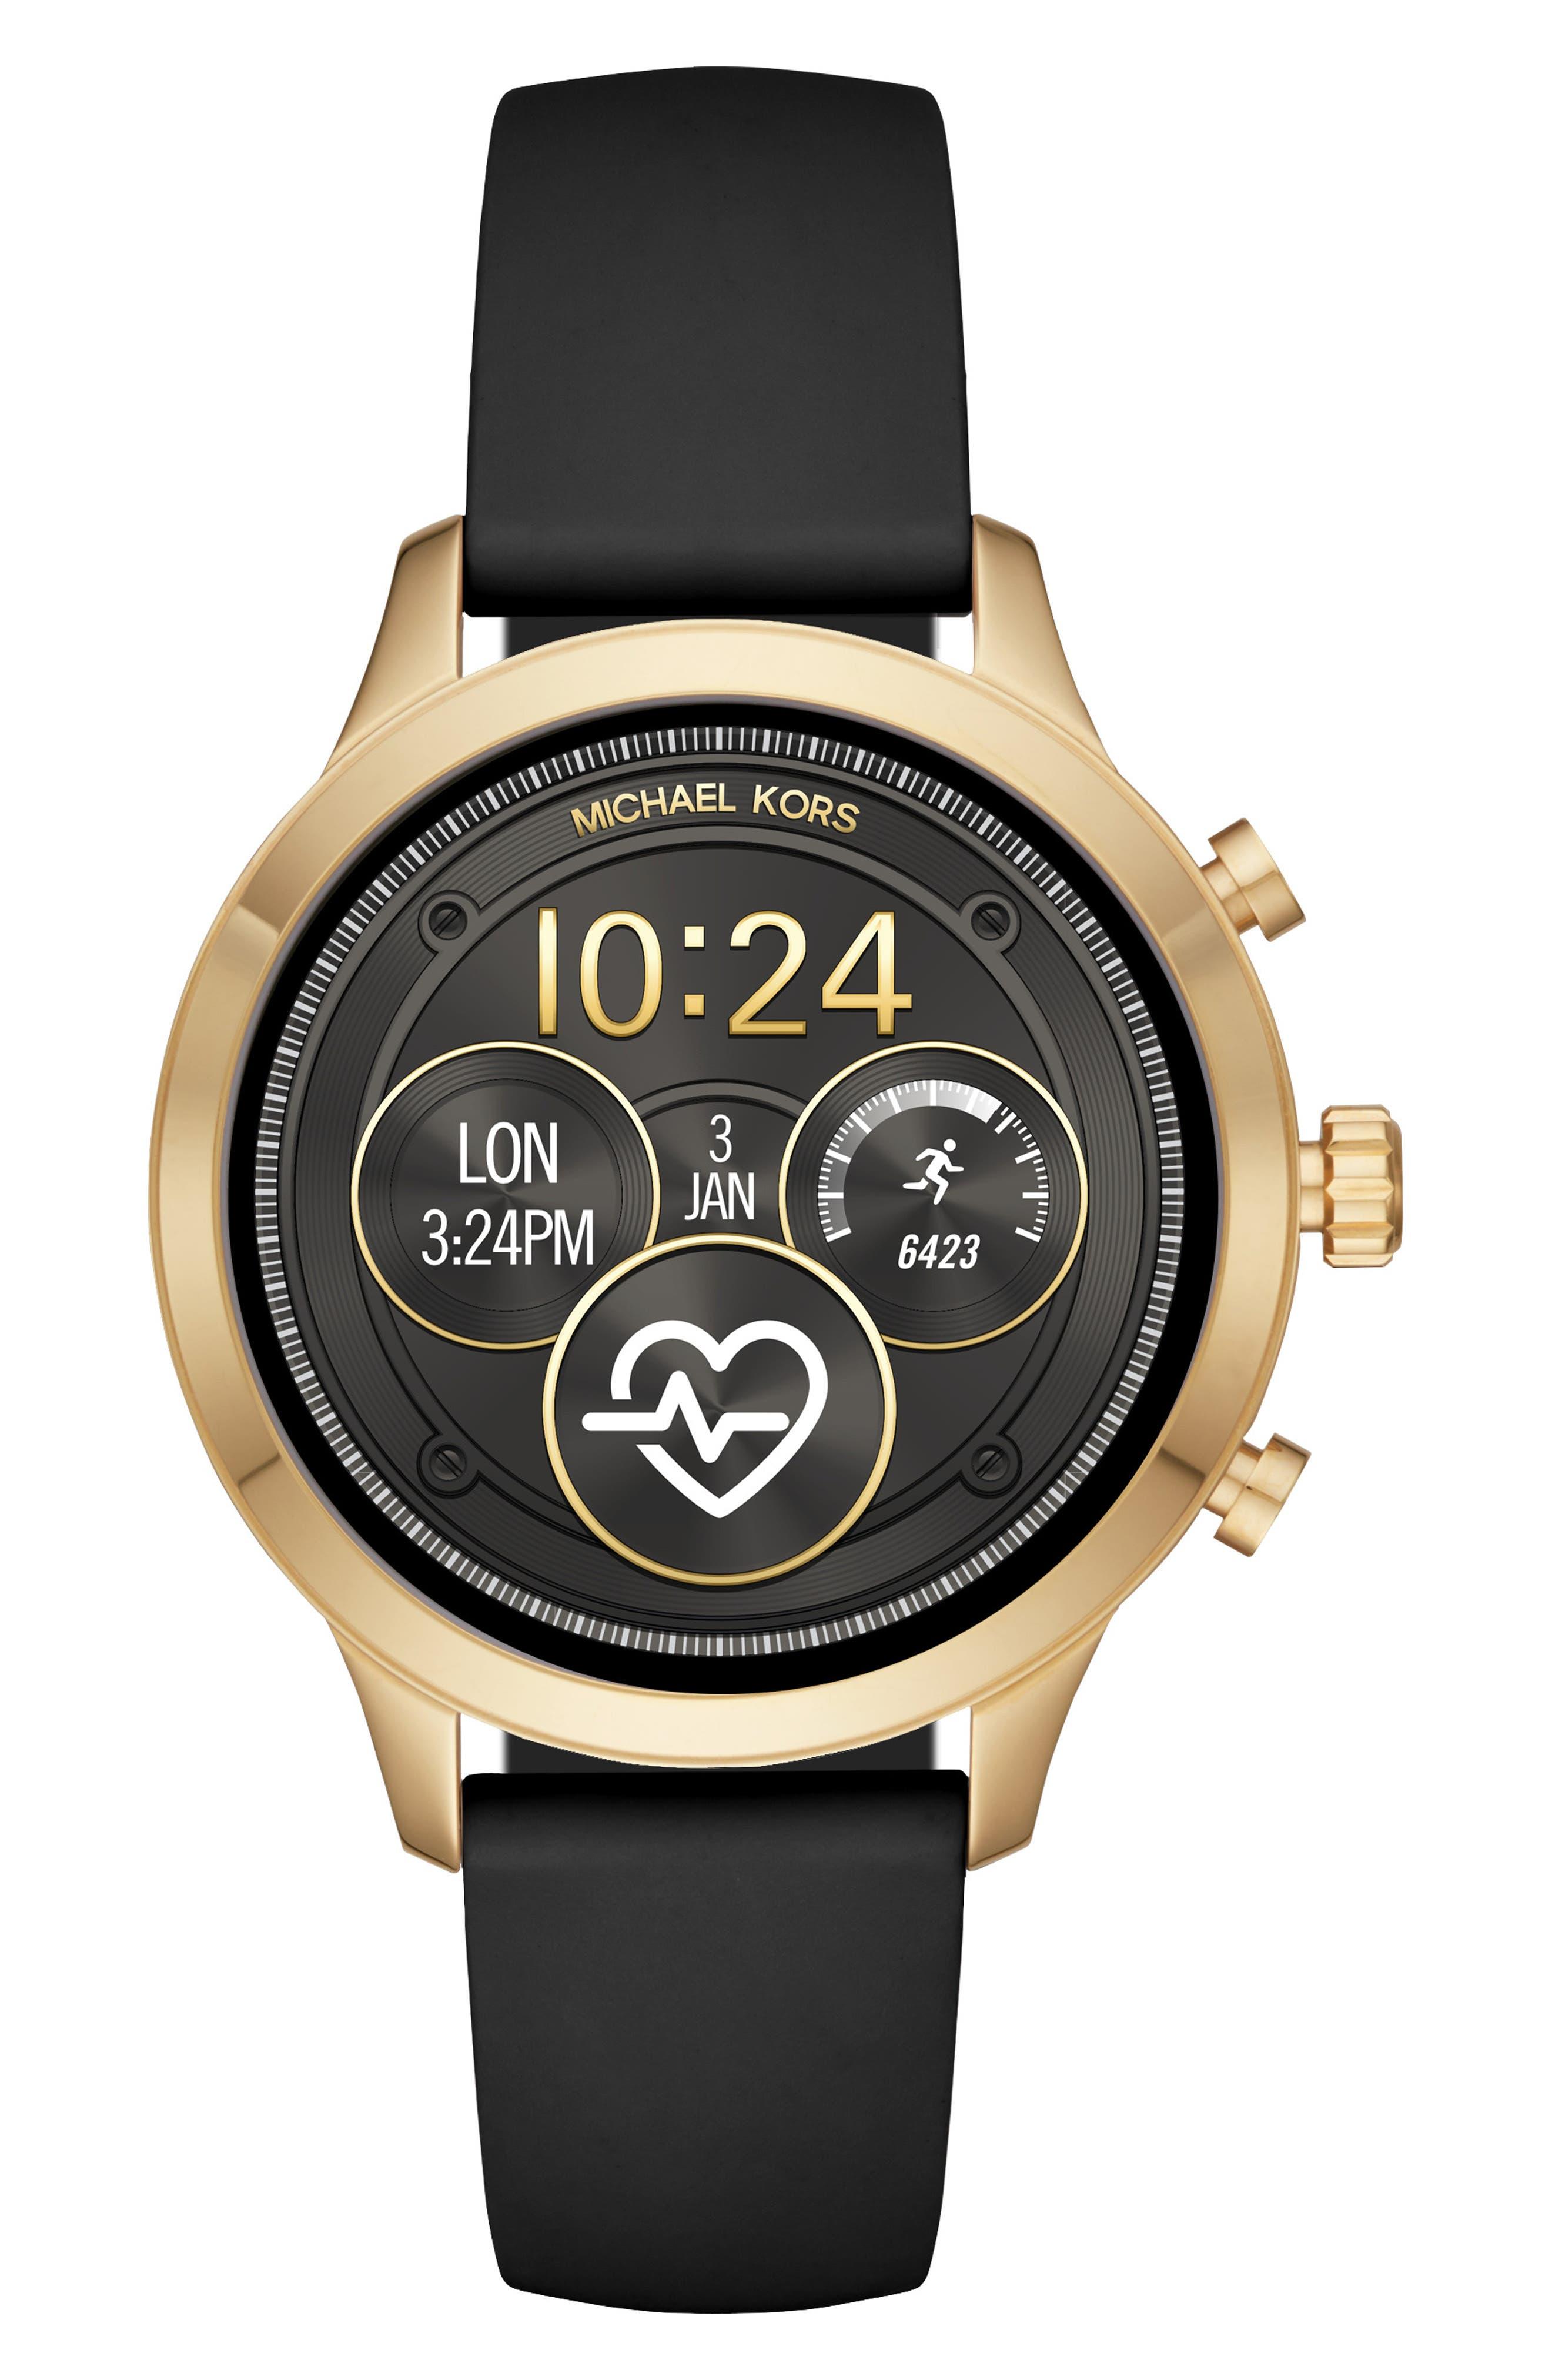 MICHAEL KORS MICHAEL Michael Kors Access Runway Smart Watch, 41mm, Main, color, BLACK/ GOLD